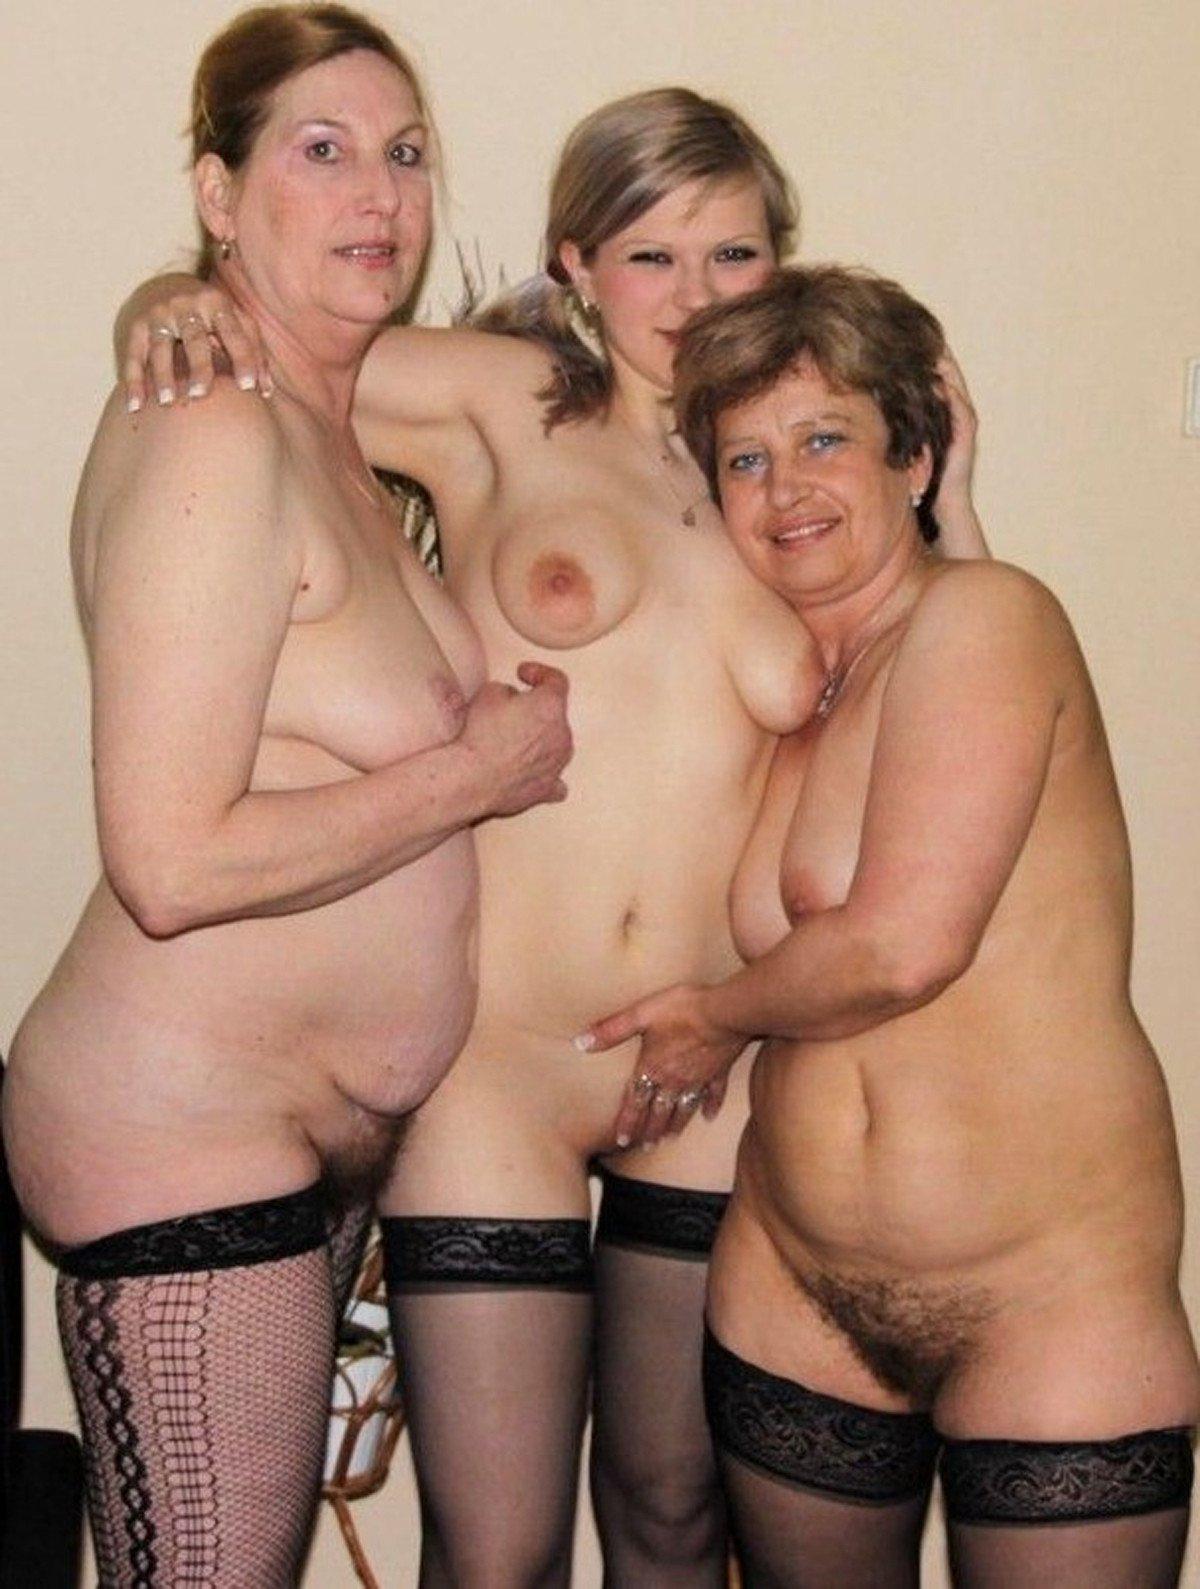 Eros nightclub enfield photos